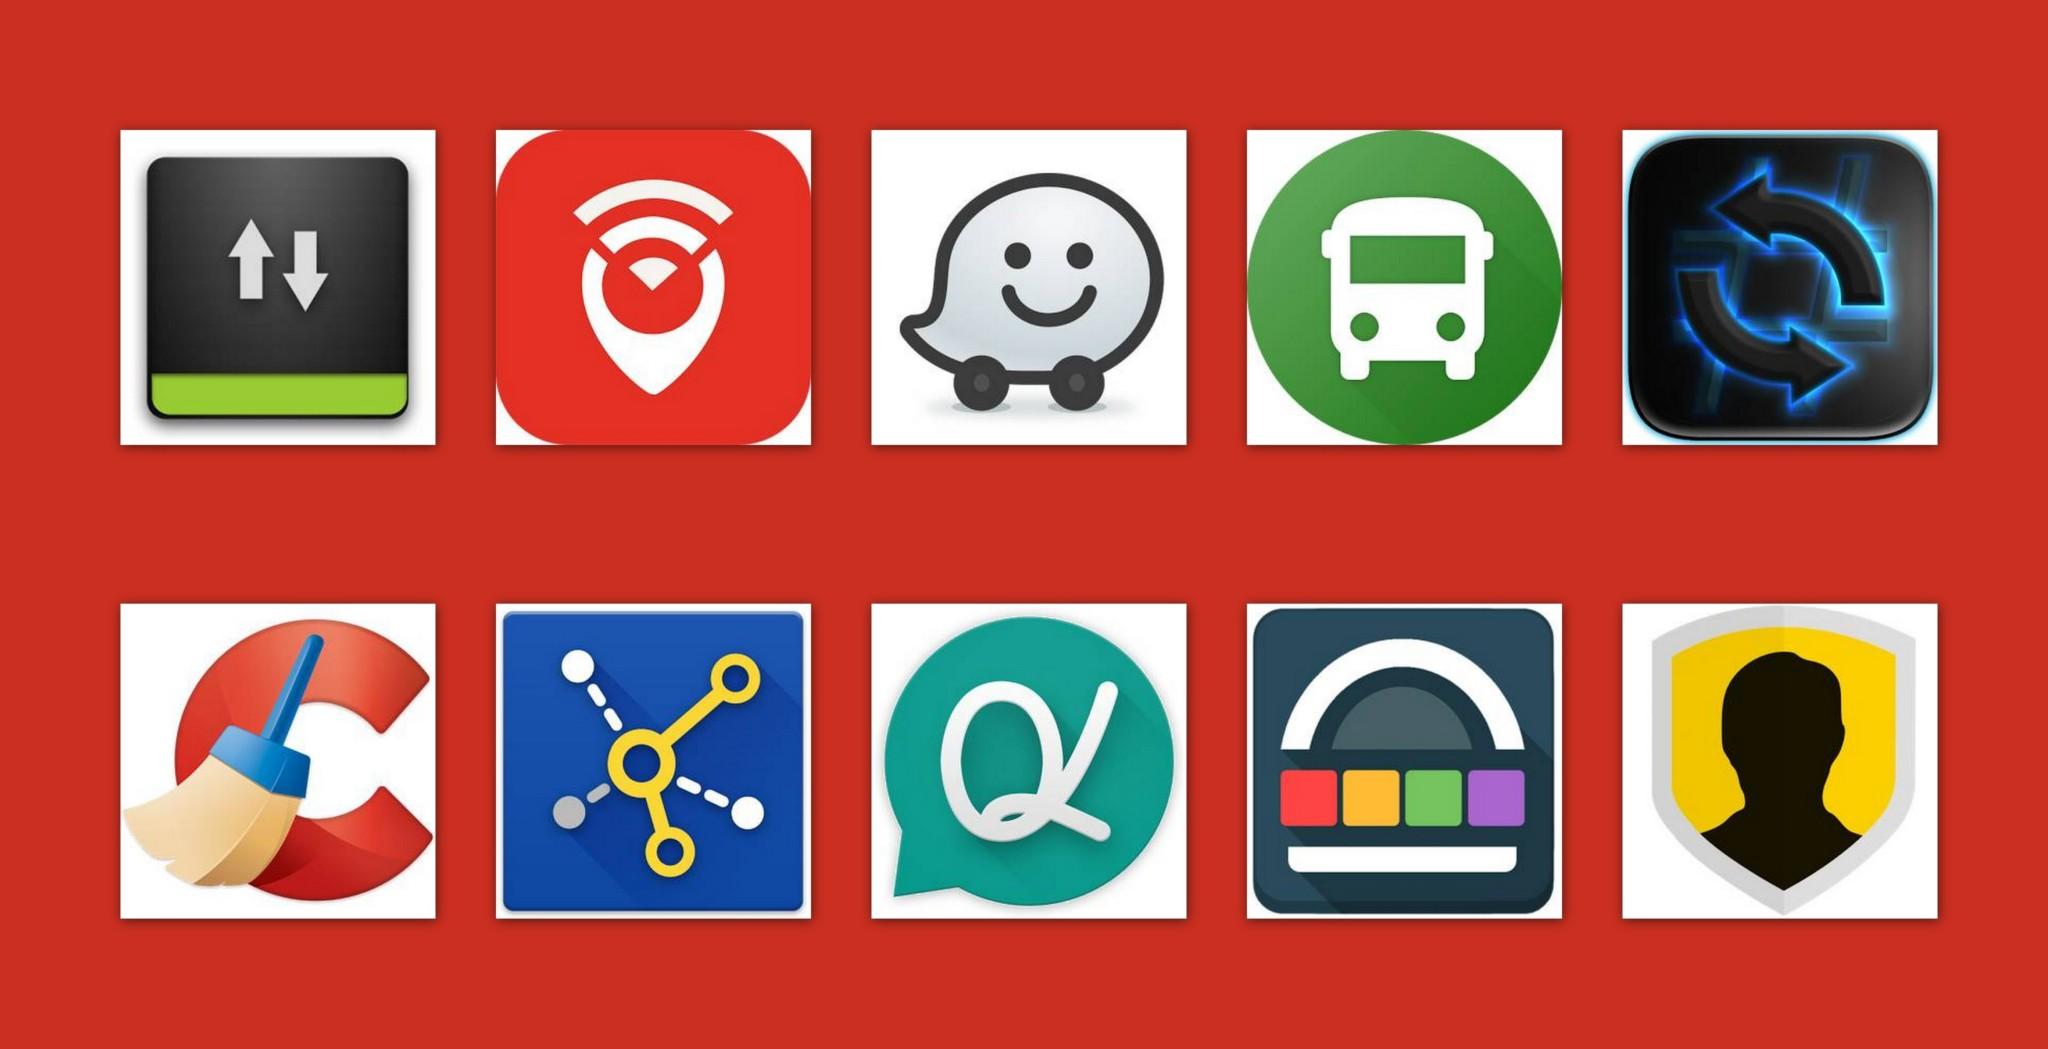 Dotekománie doporučuje – top 10 aplikací [ohlédnutí]